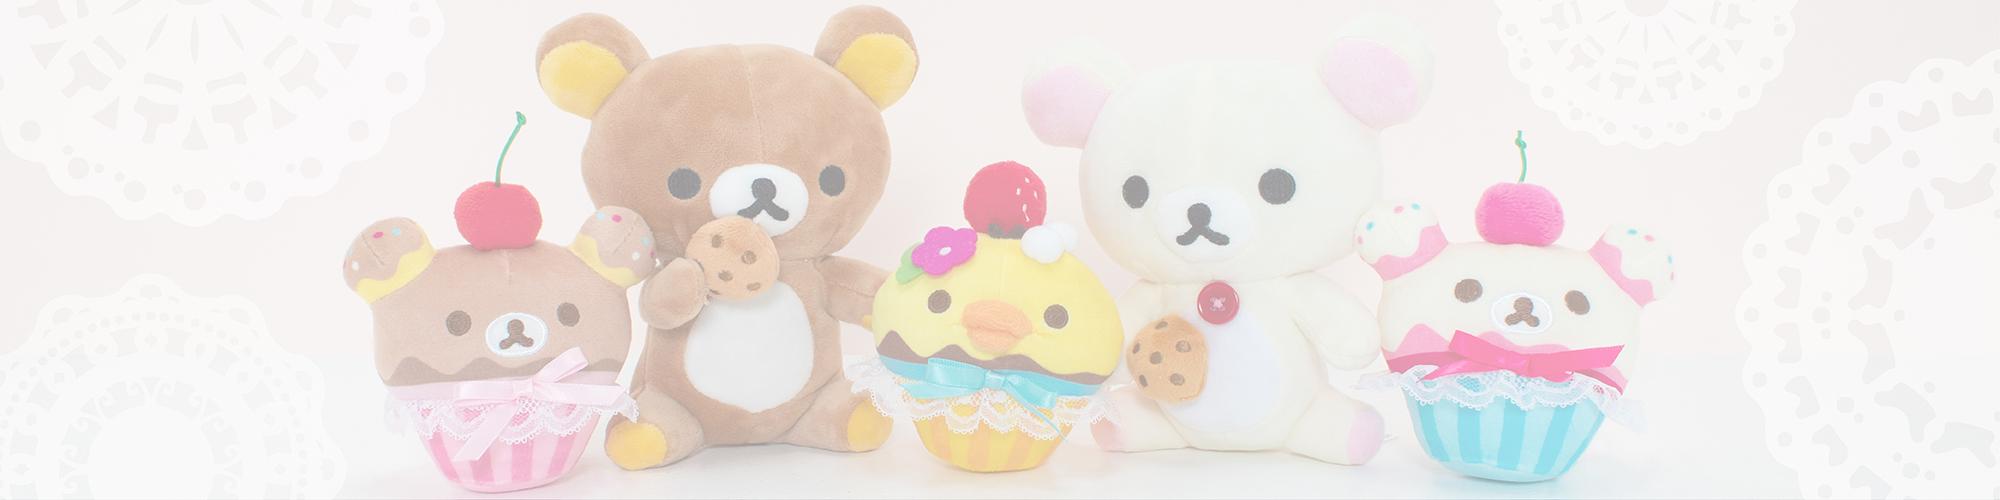 Rilakkuma, Korilakkuma, Kiiroitori cupcake keychains and small plush.